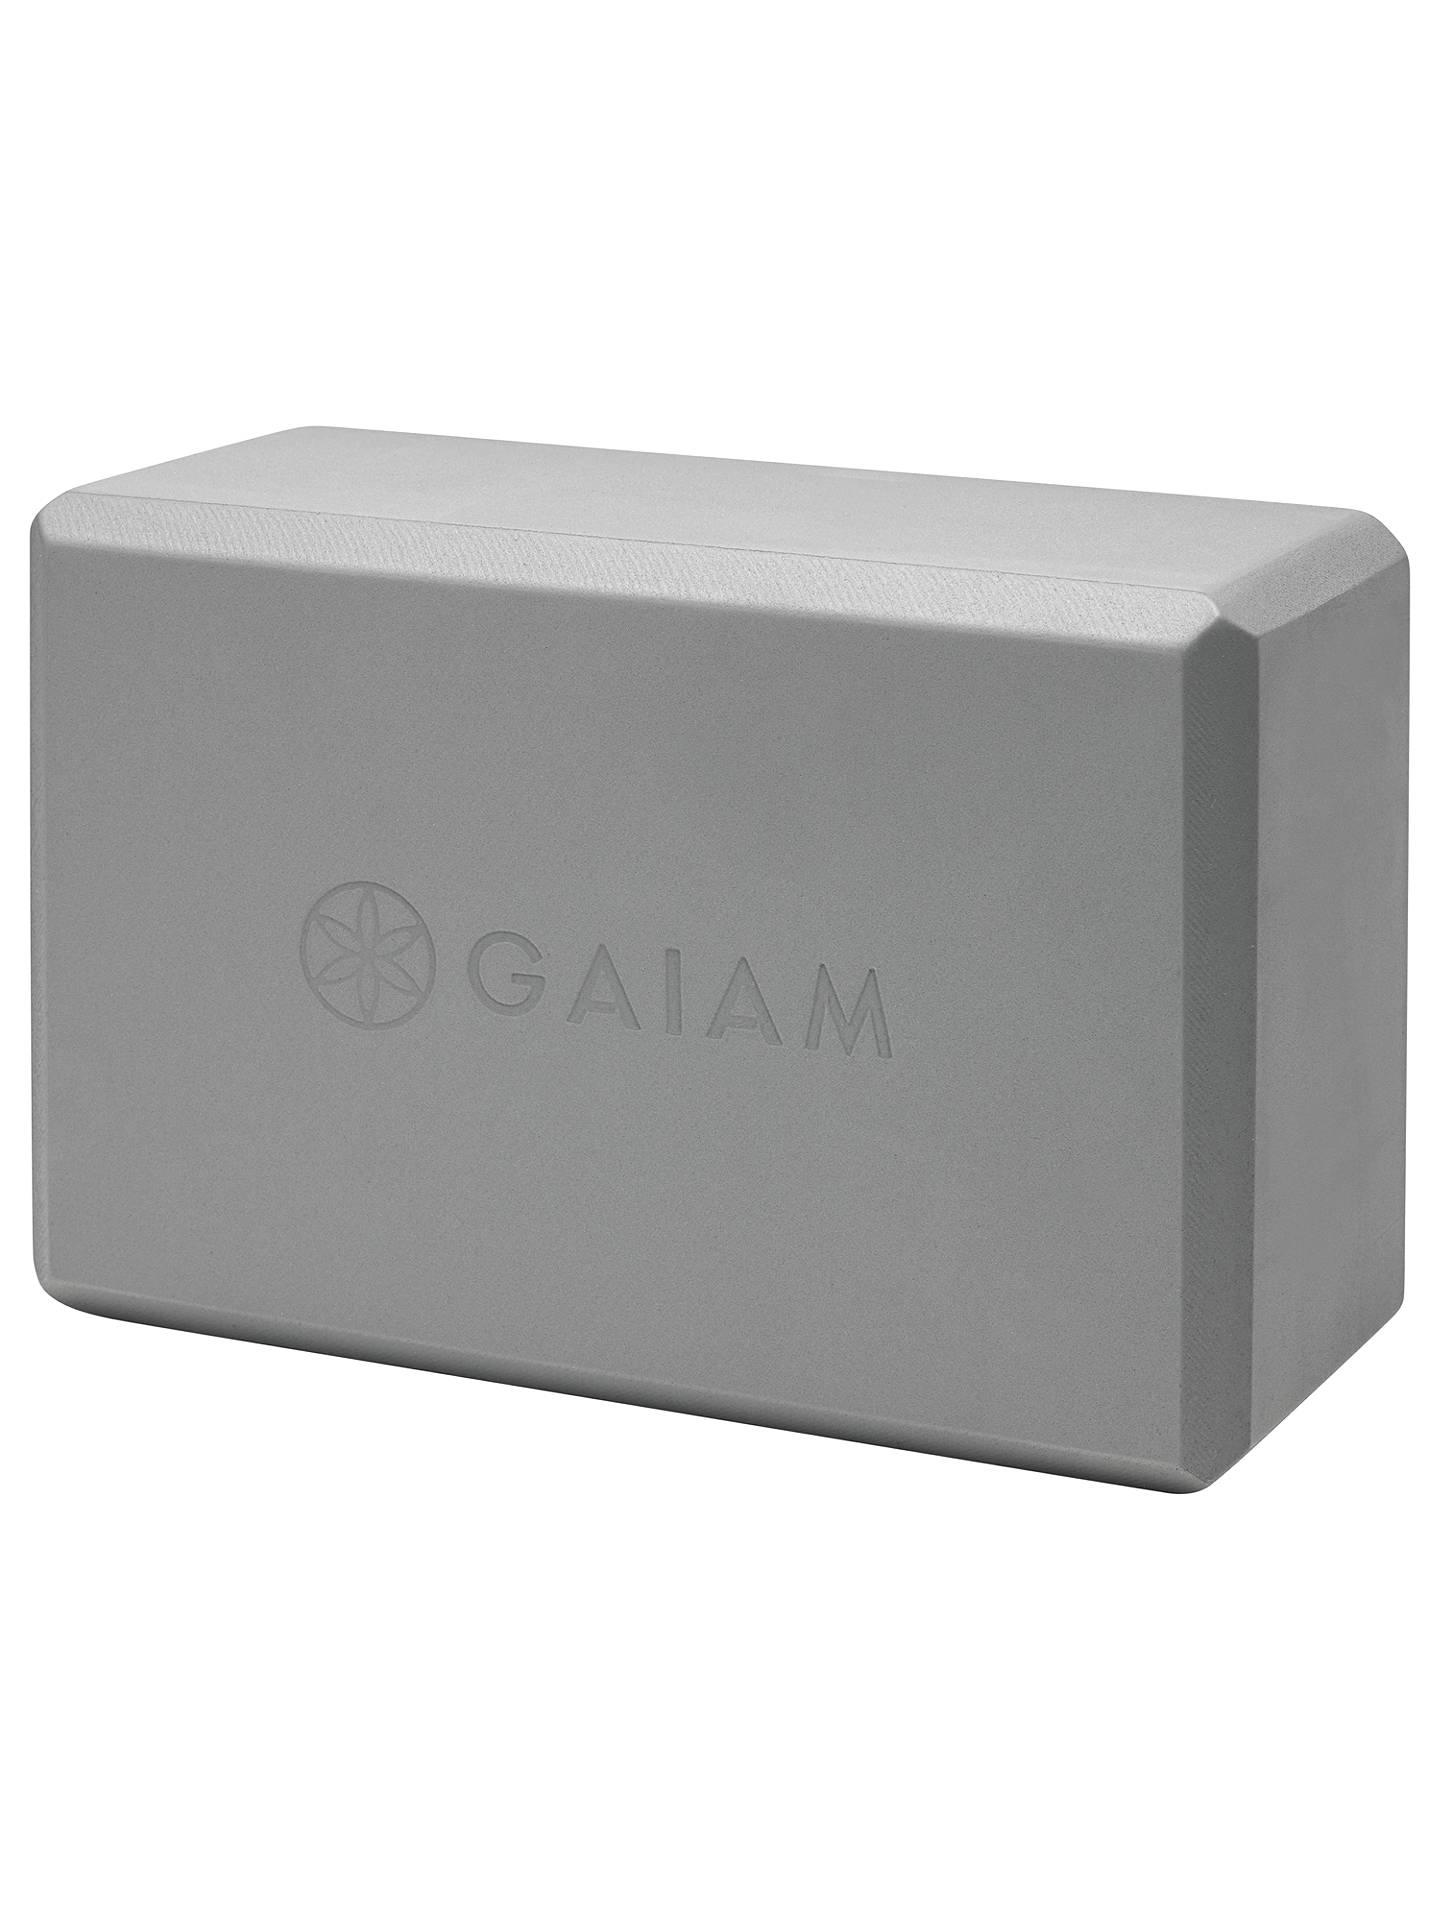 Gaiam Yoga Block Grey